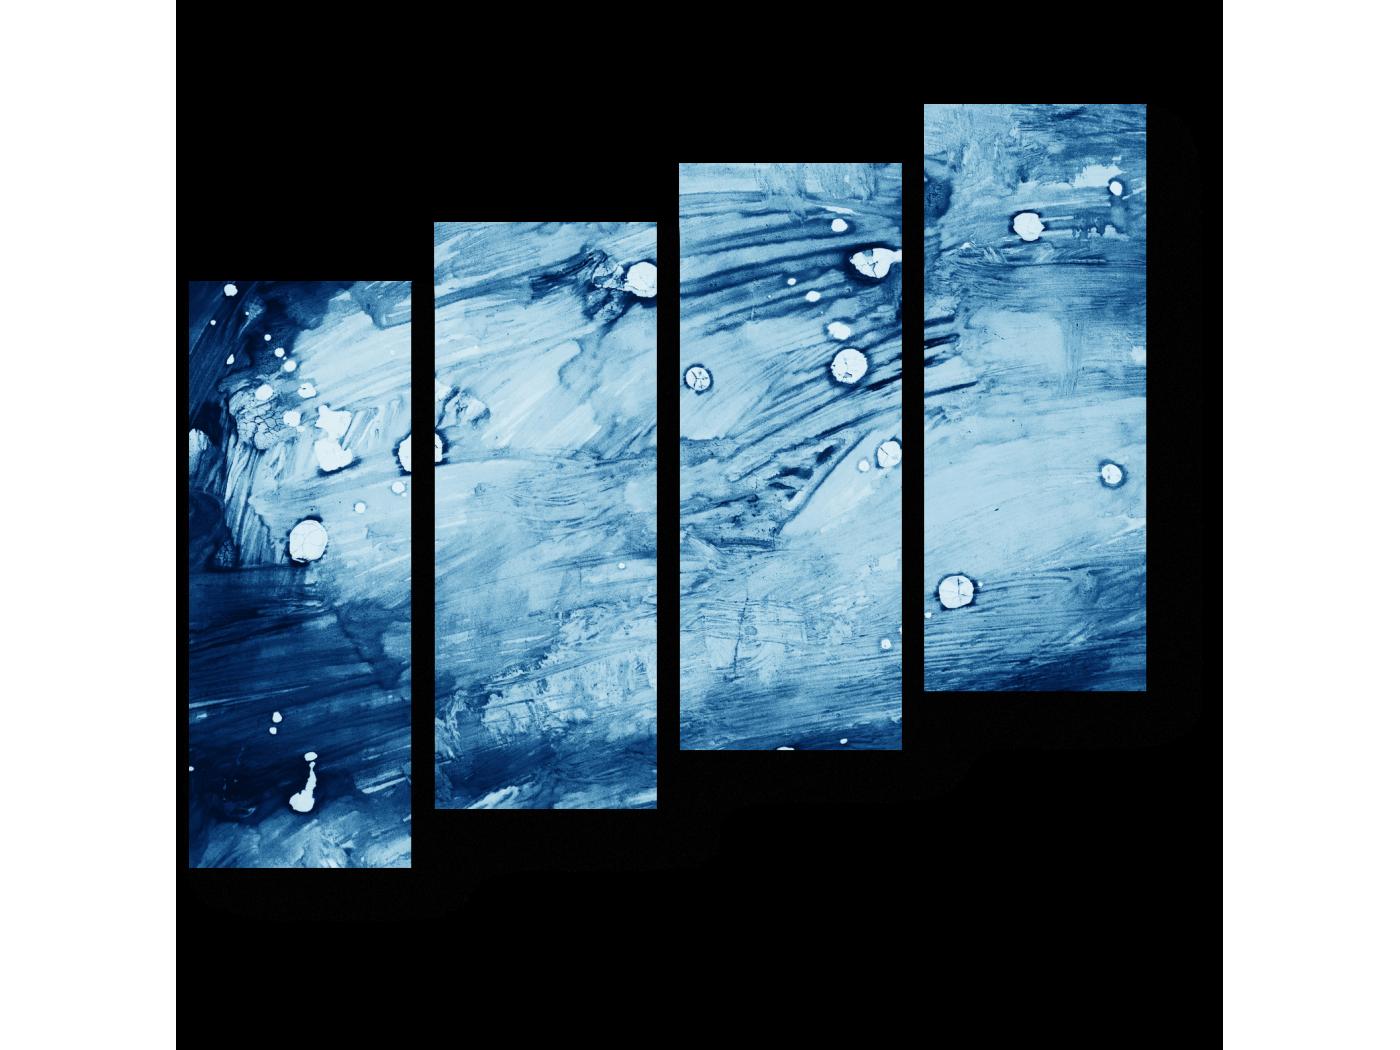 Модульная картина Брызги синей краски (80x69) фото